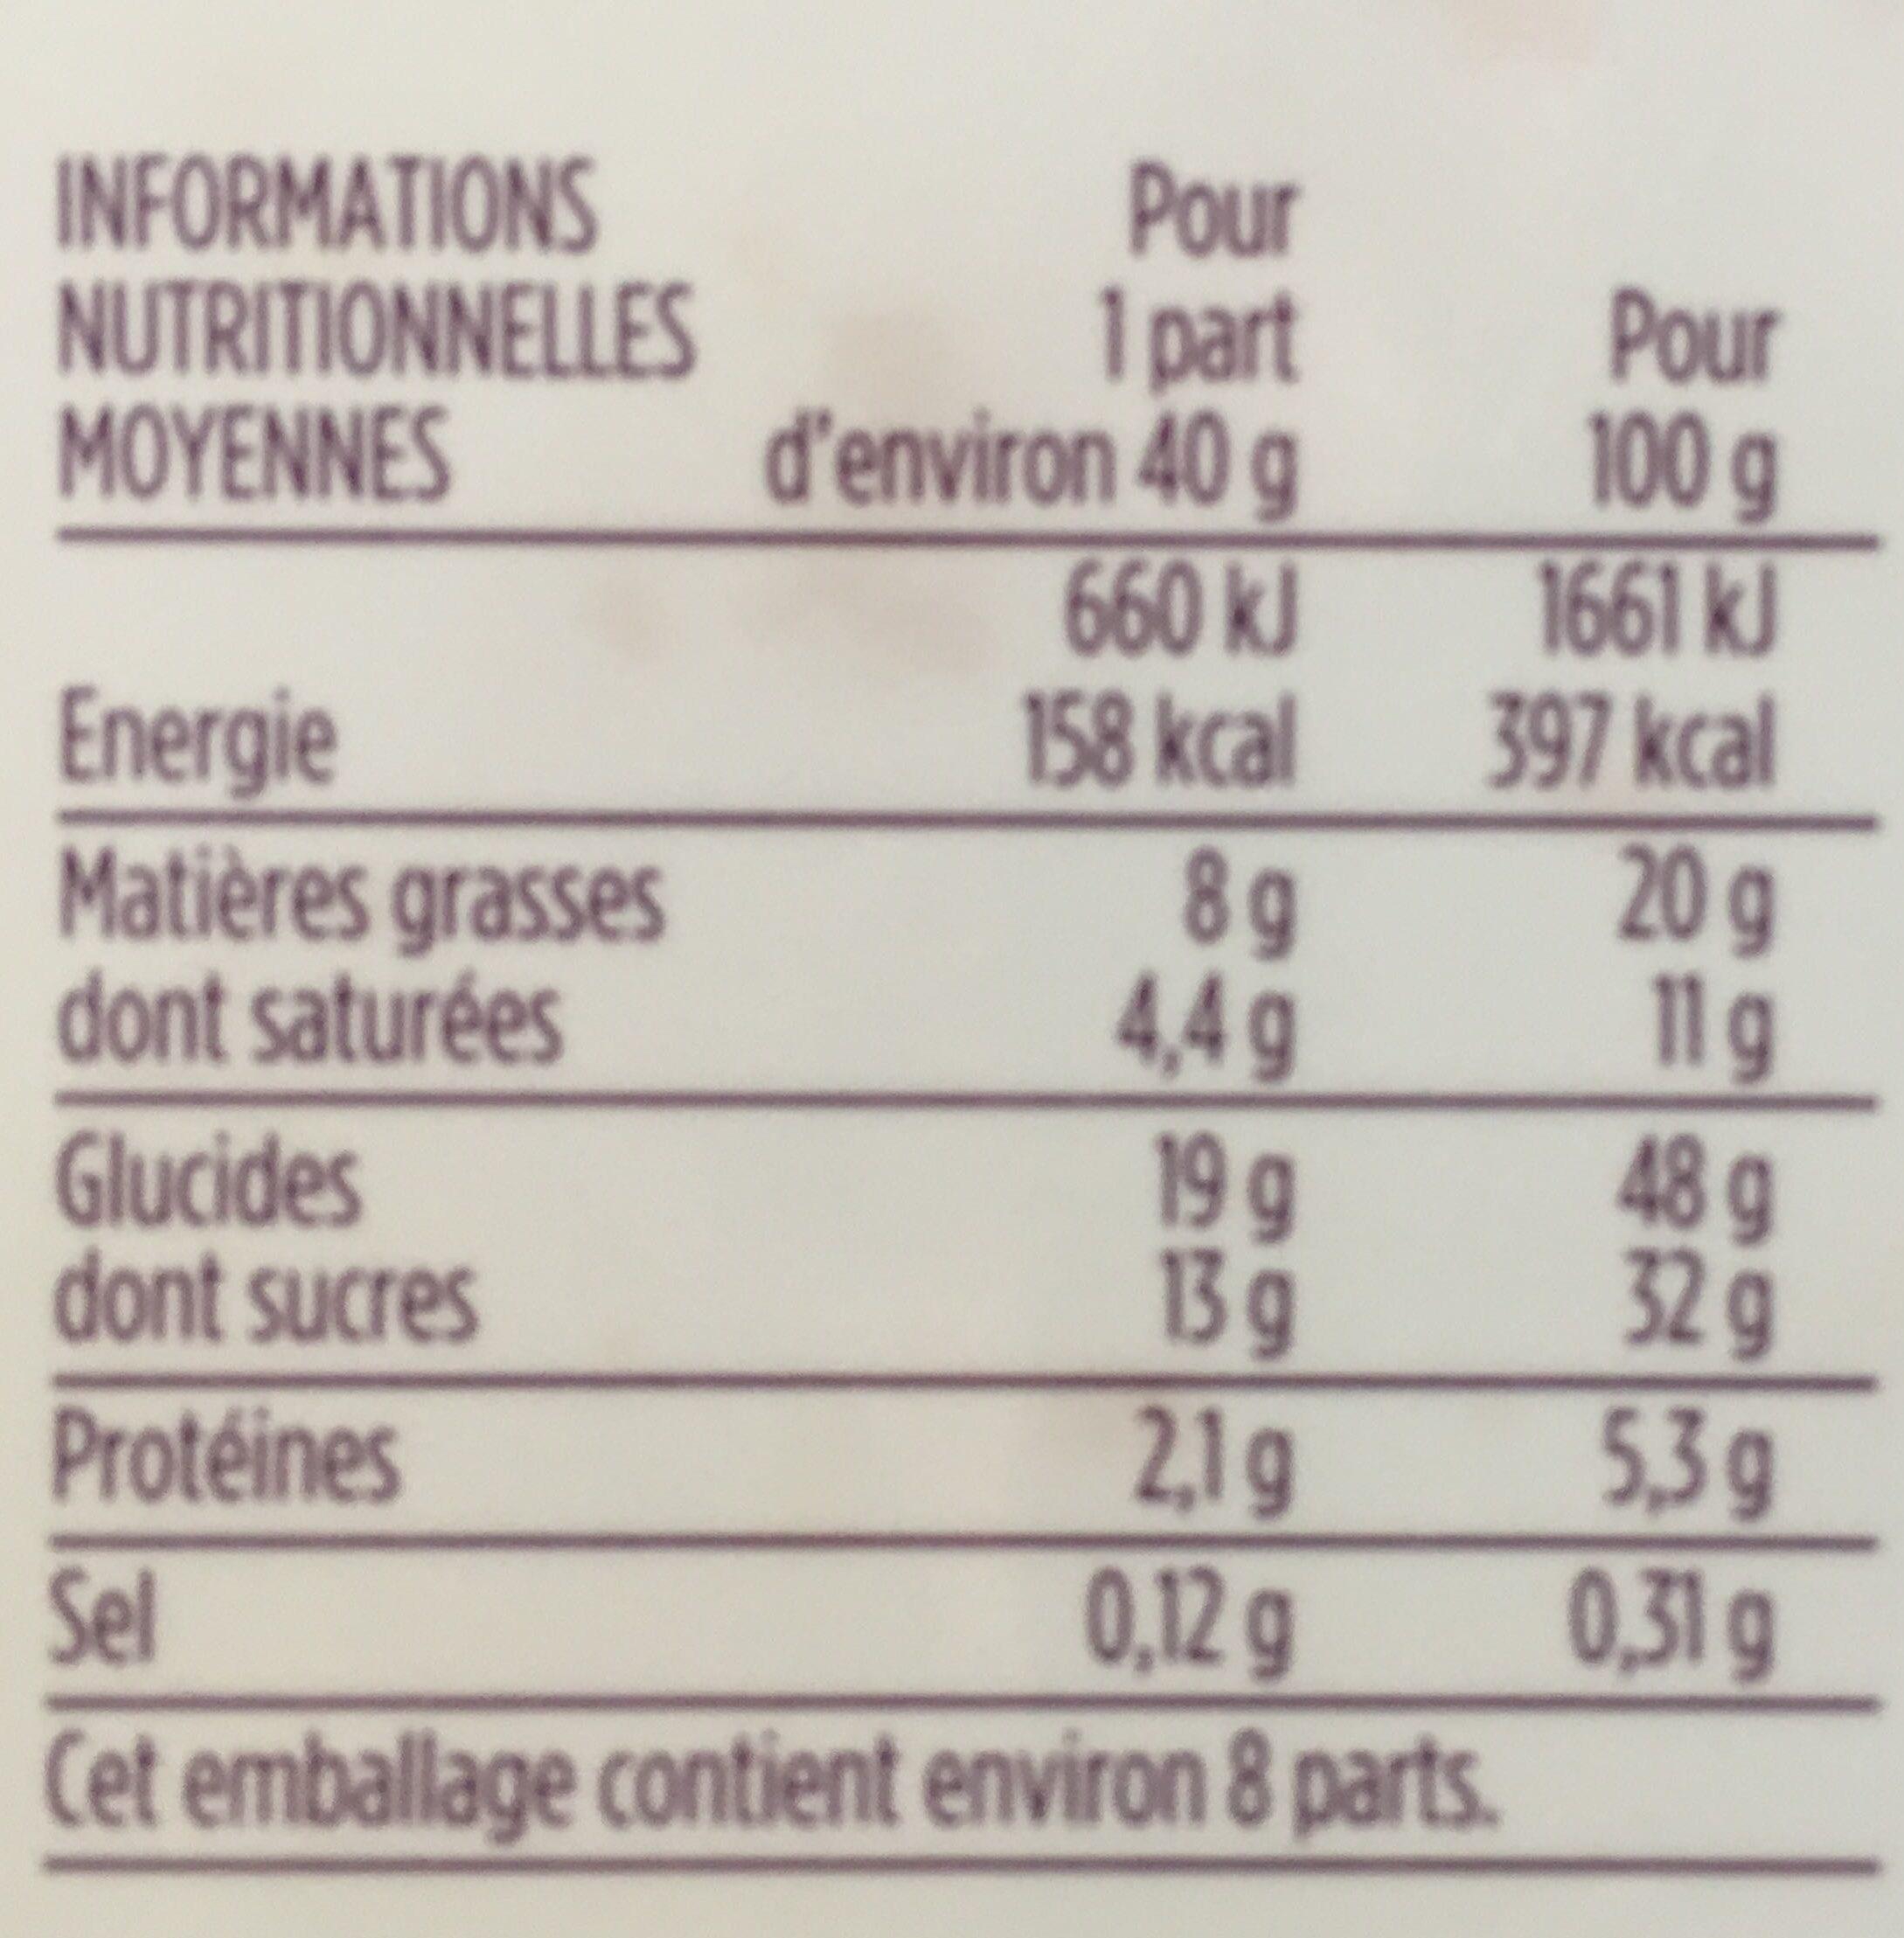 Cake gourmand citron - Voedingswaarden - fr